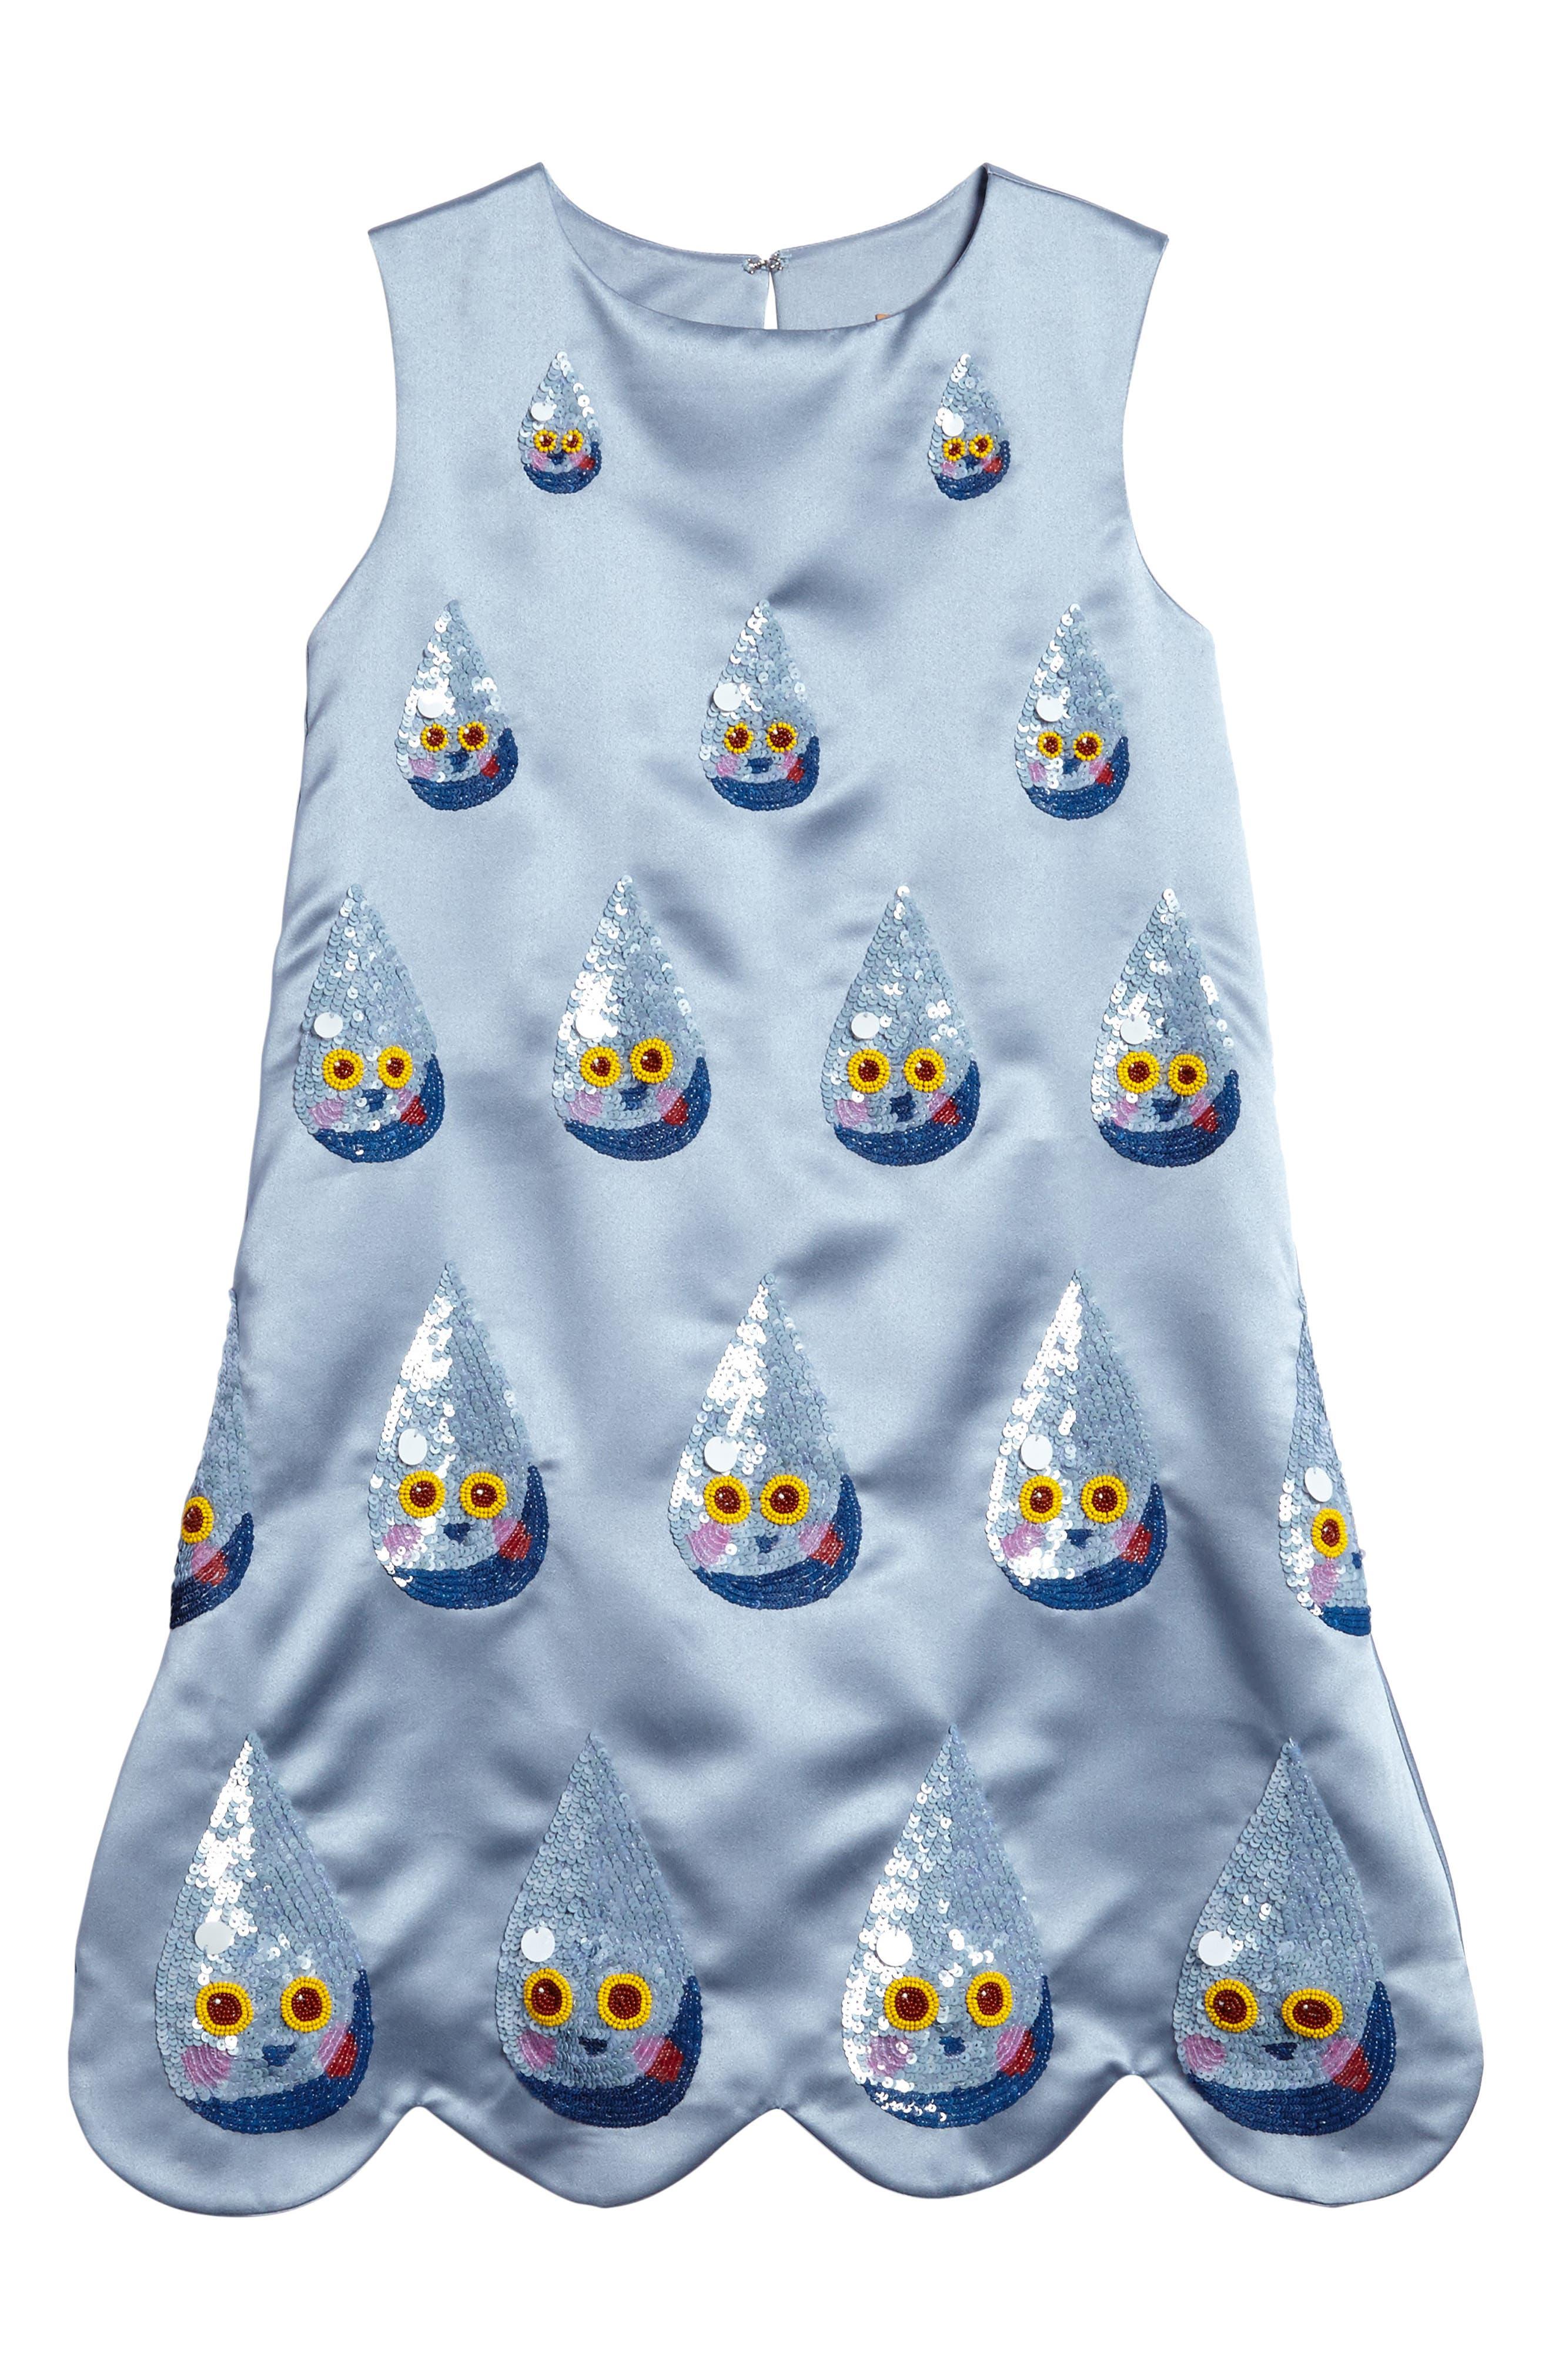 Sequin Raindrop Shift Dress,                             Main thumbnail 1, color,                             400